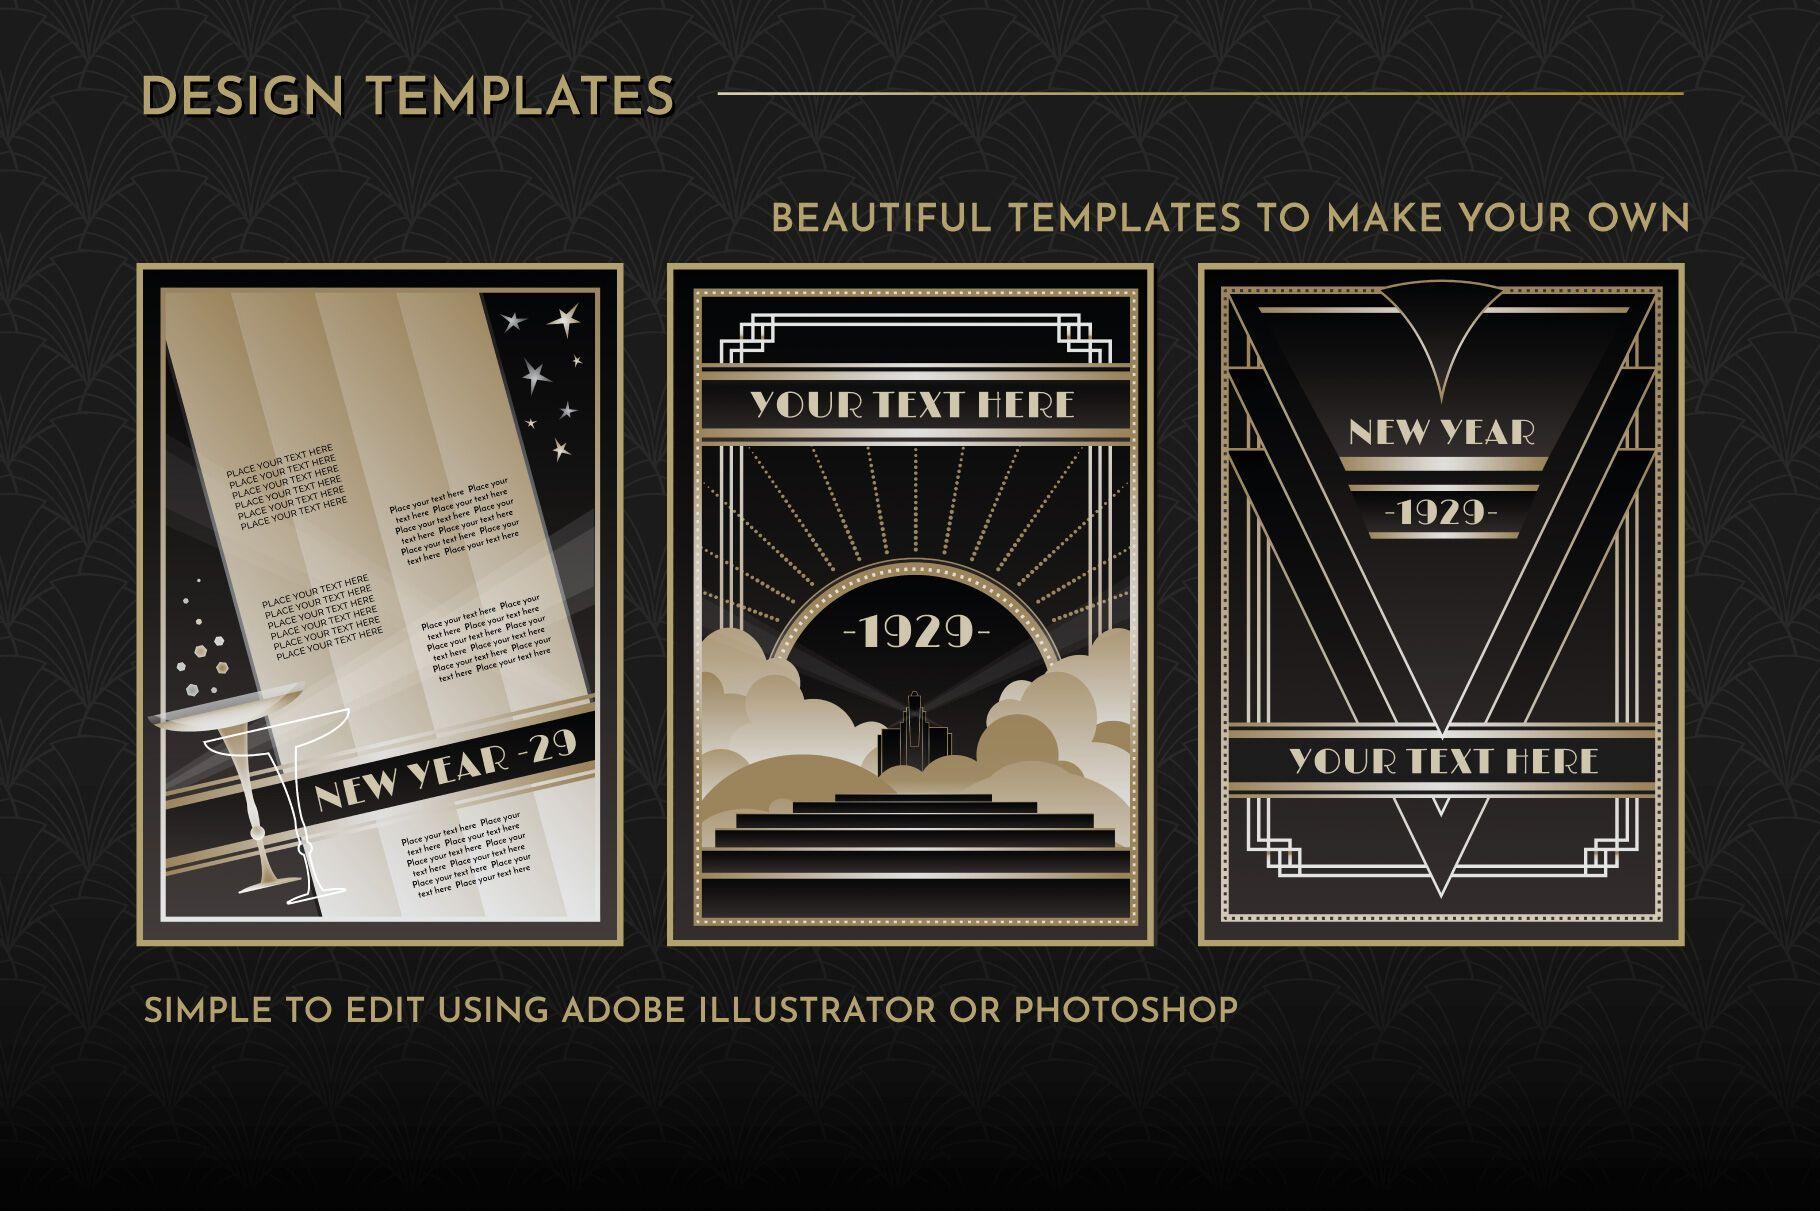 Art Deco Menu Templates Vol 1 By wingsart TheHungryJPEG.com #Sponsored  #Menu, #PAID, #Deco, #Art, #Templates in 2020 | Art deco logo, Art deco, Art  deco poster